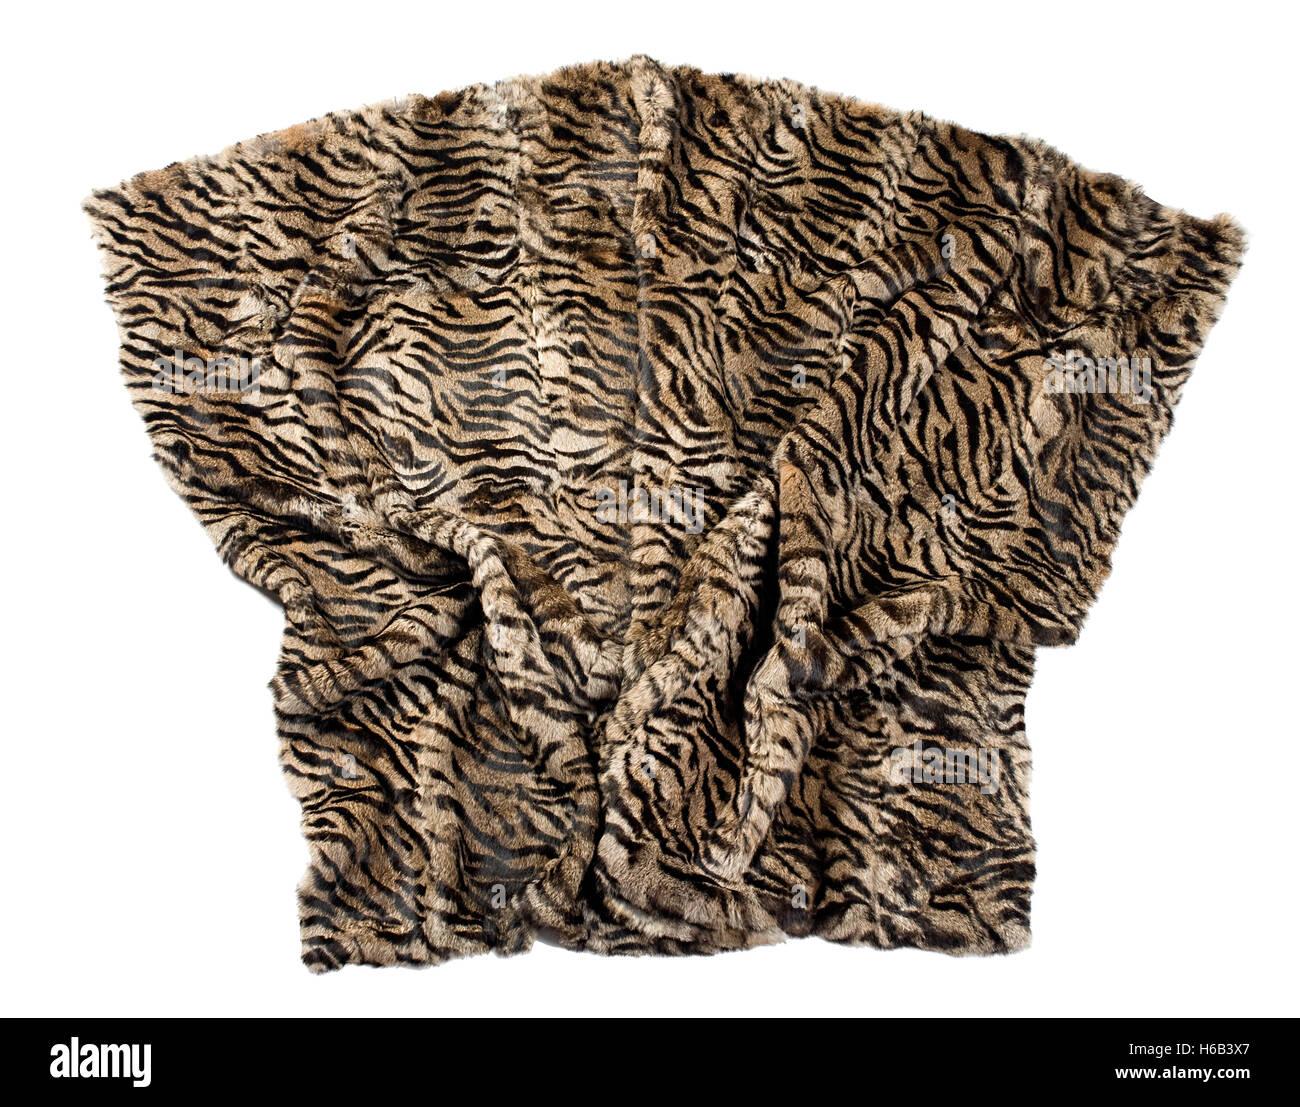 Leopard Print Blanket Stockfotos Leopard Print Blanket Bilder Alamy